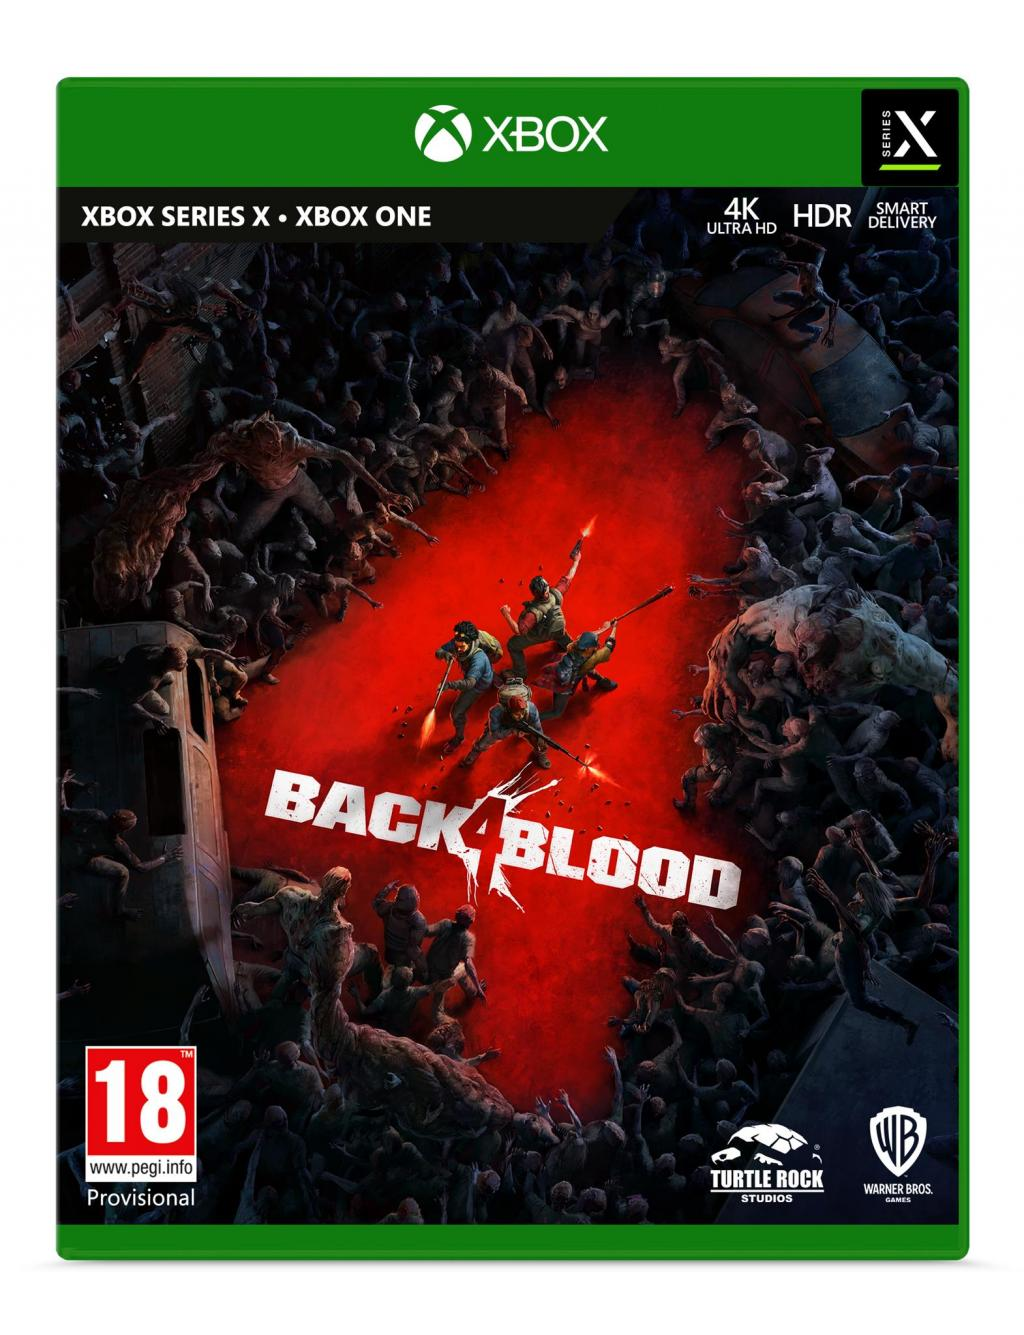 Back 4 Blood  - XBOX ONE & XBOX SERIES X_1